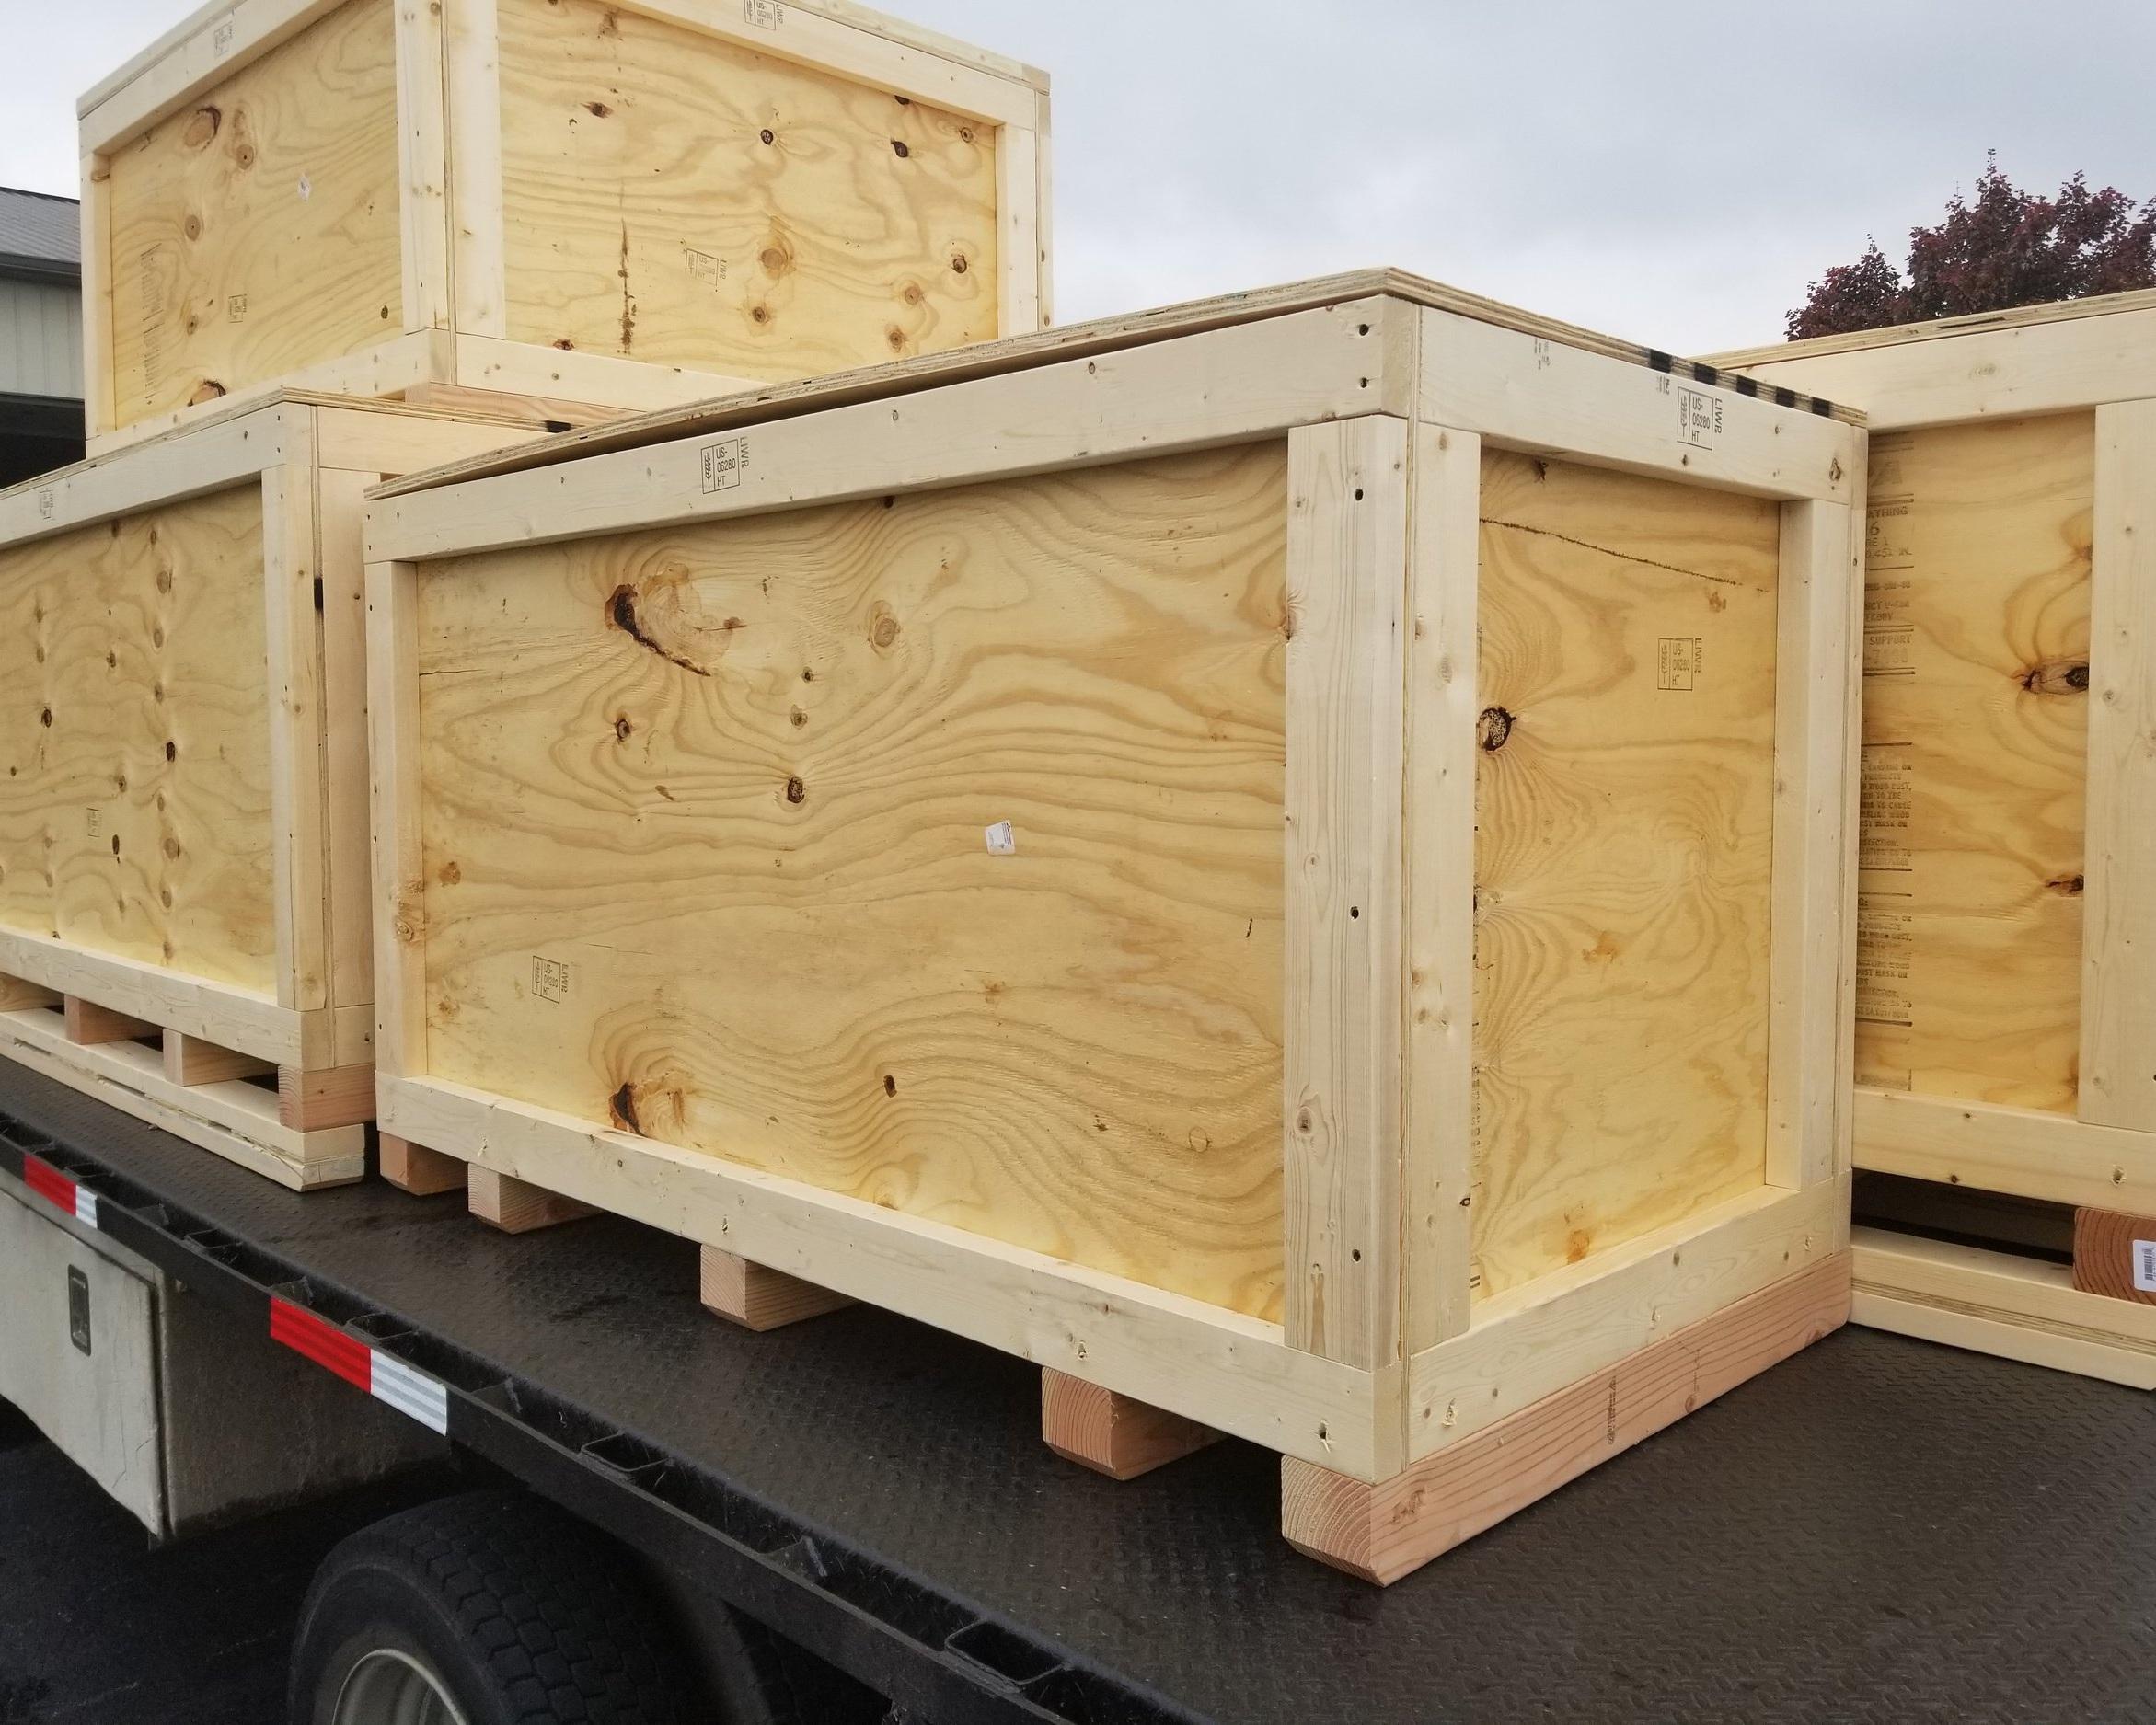 ISPM-15 Certified International Crates -